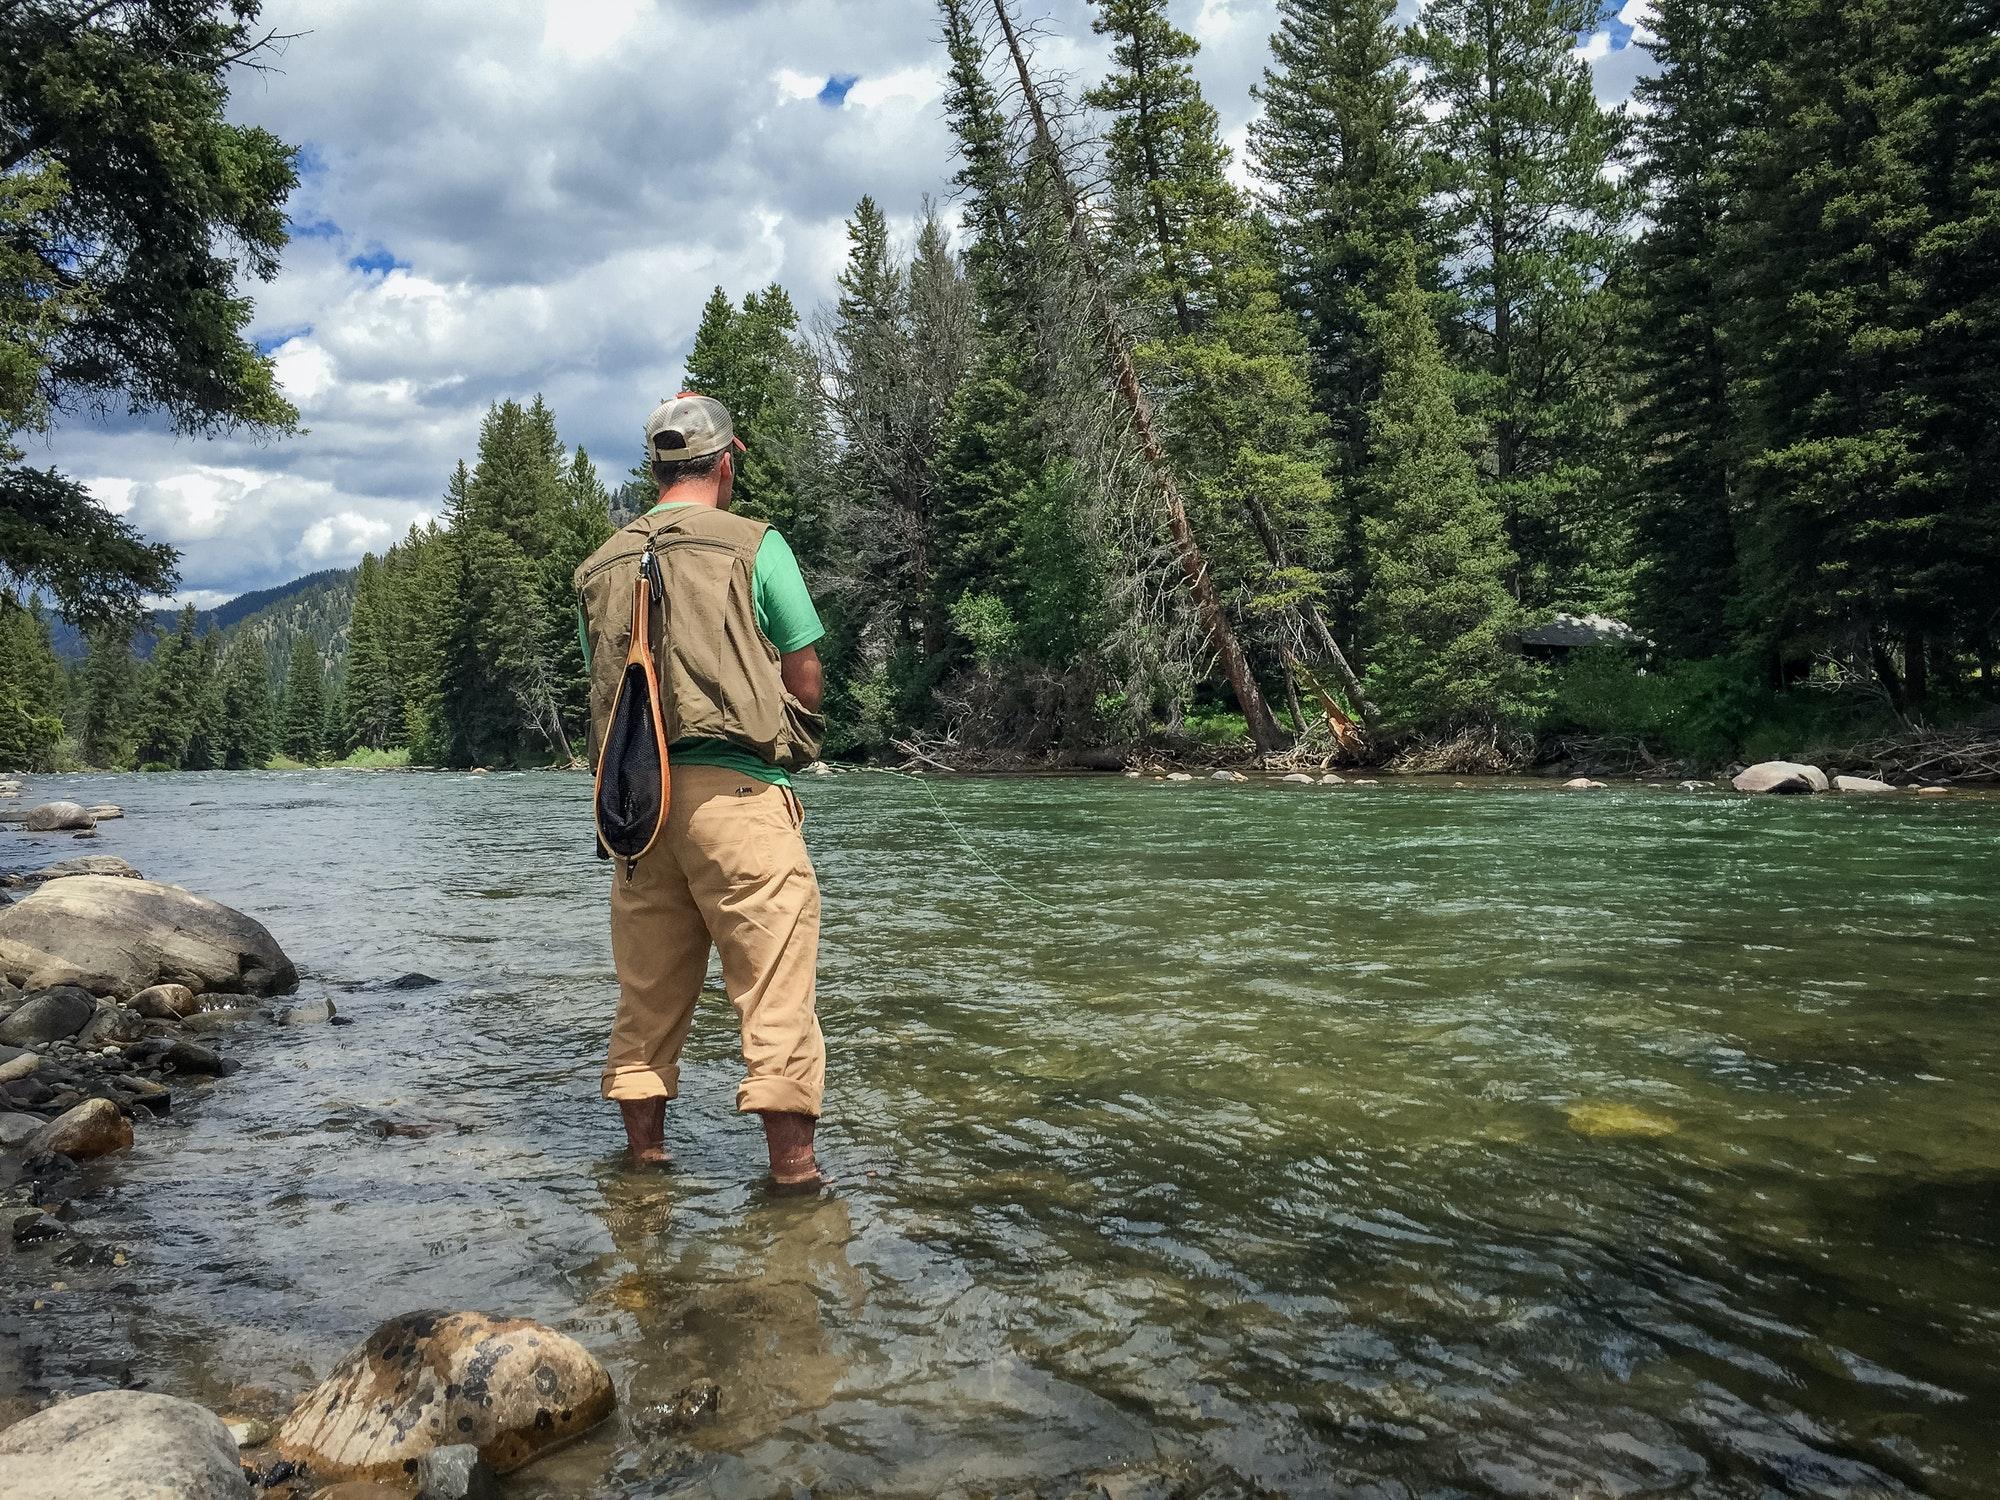 Flyfishing the Gallatin River in Montana.